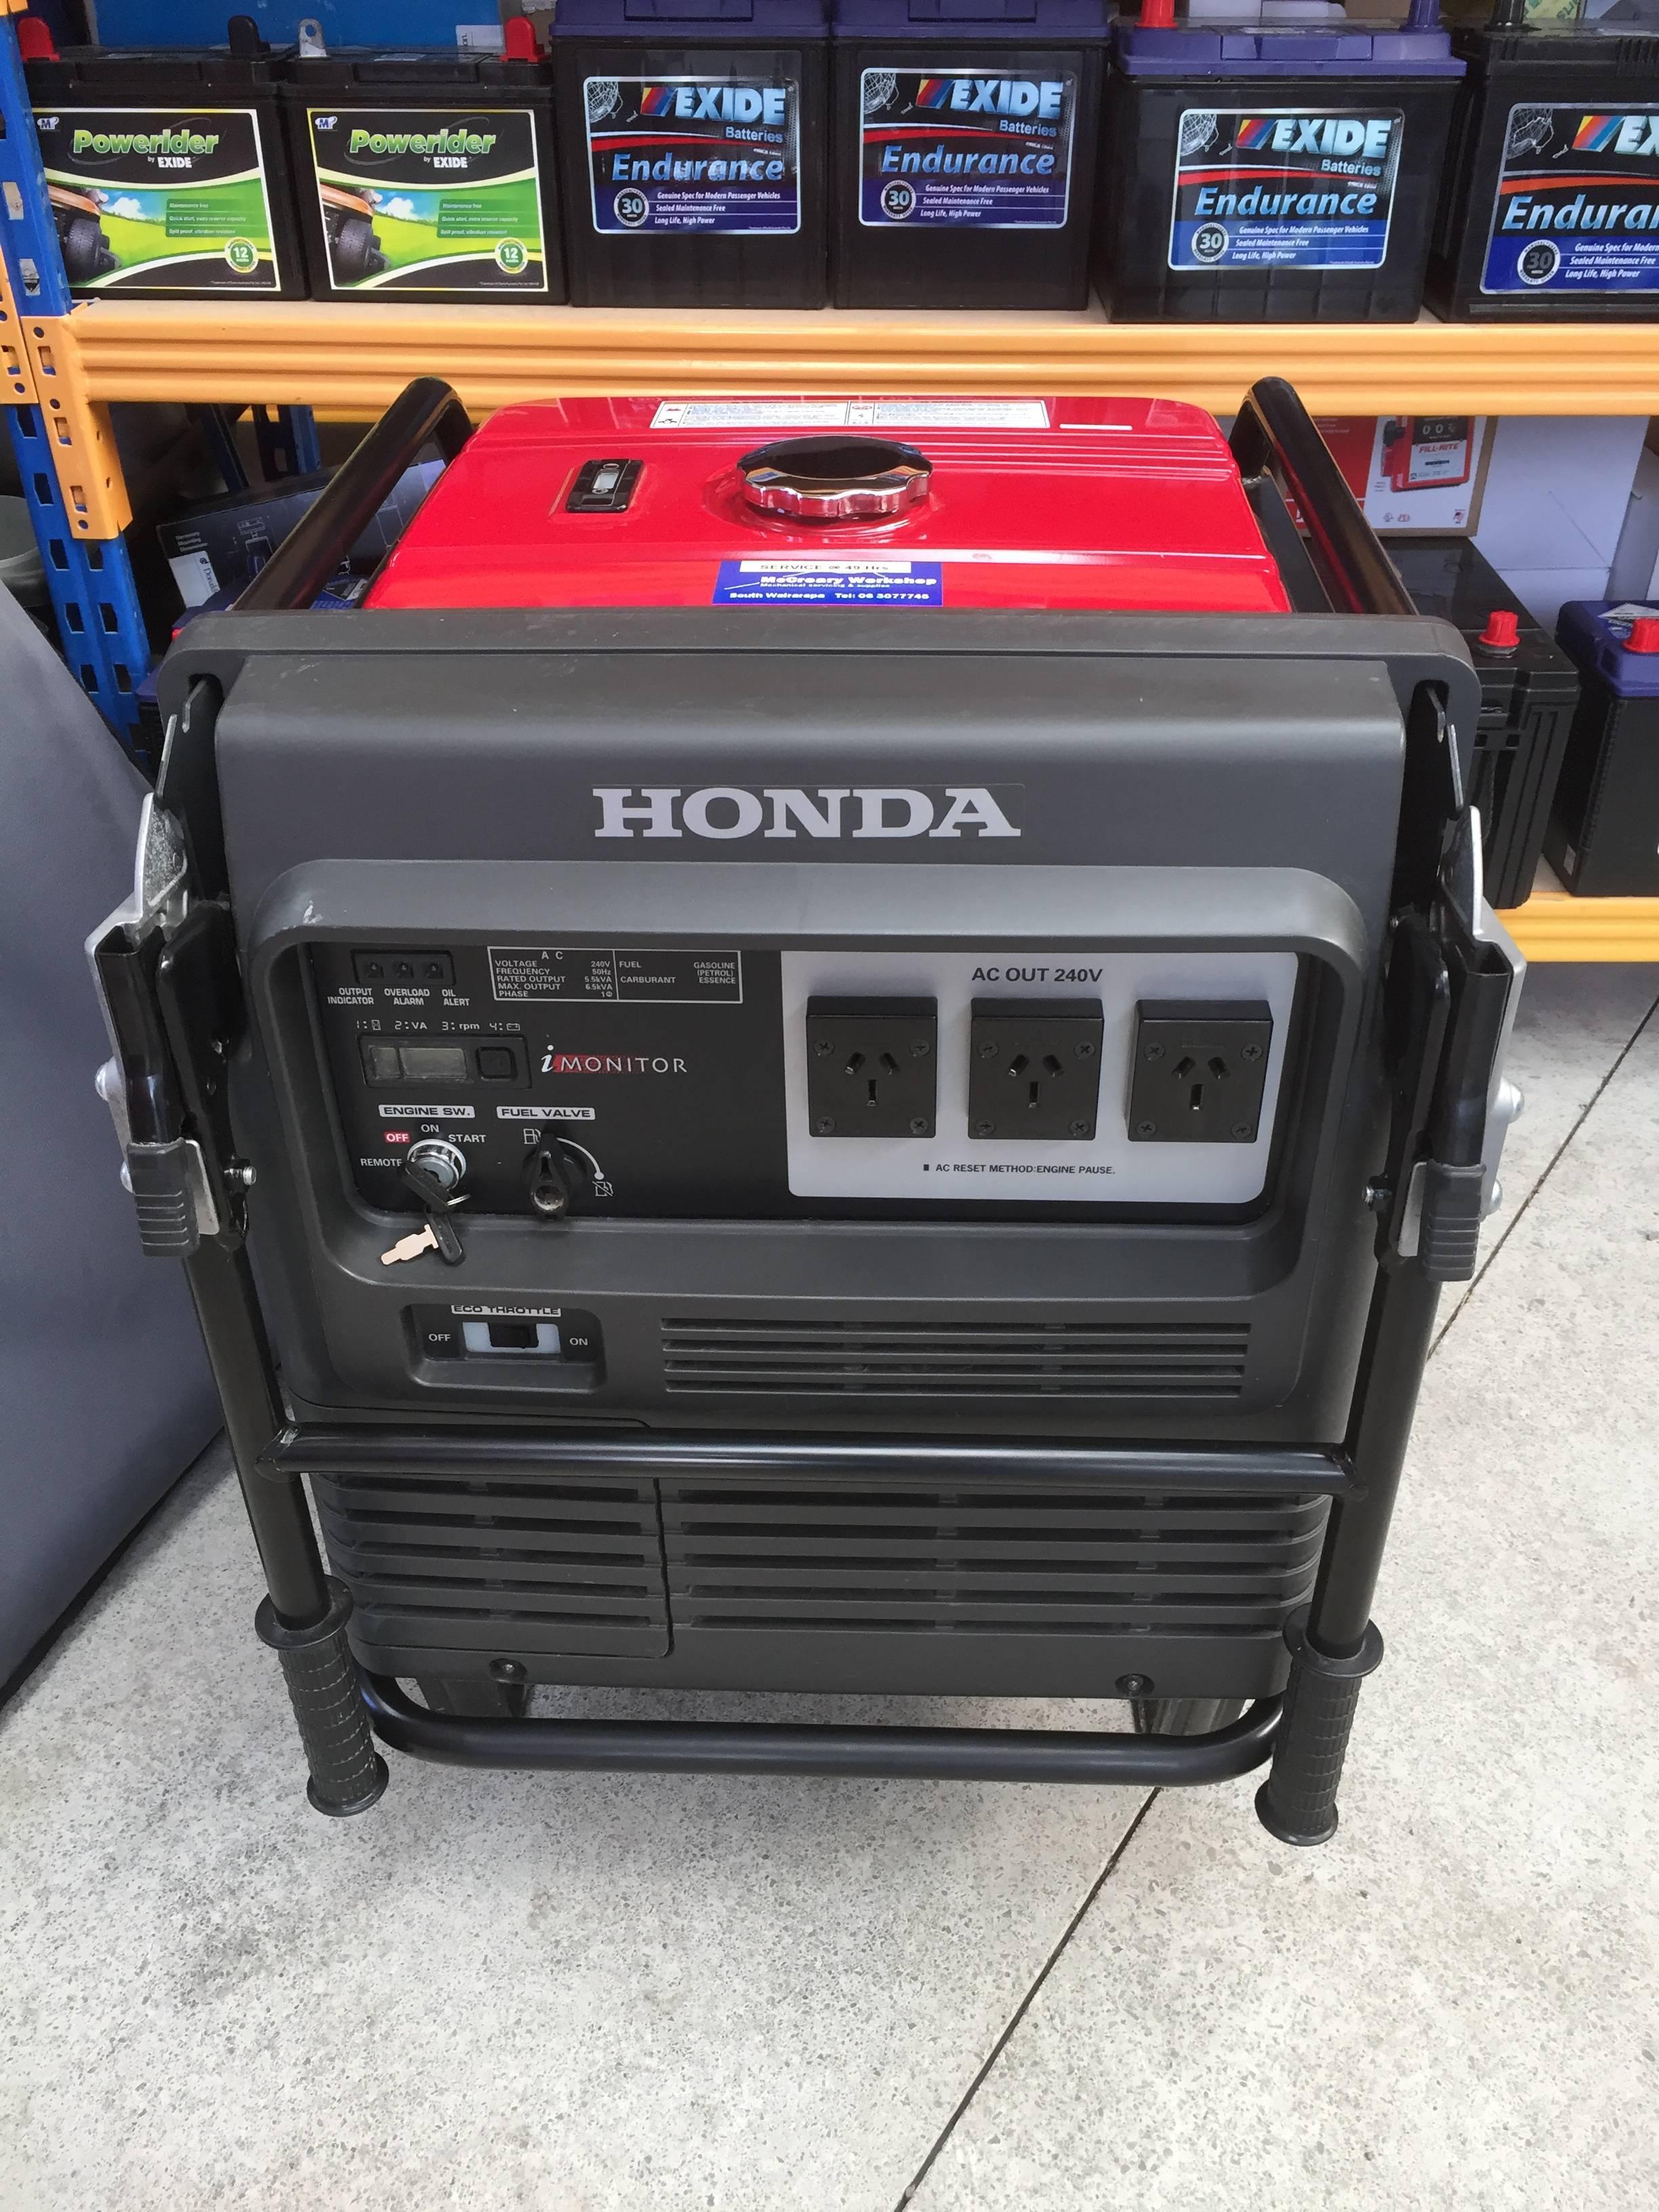 Honda Inverter EU65is Generator